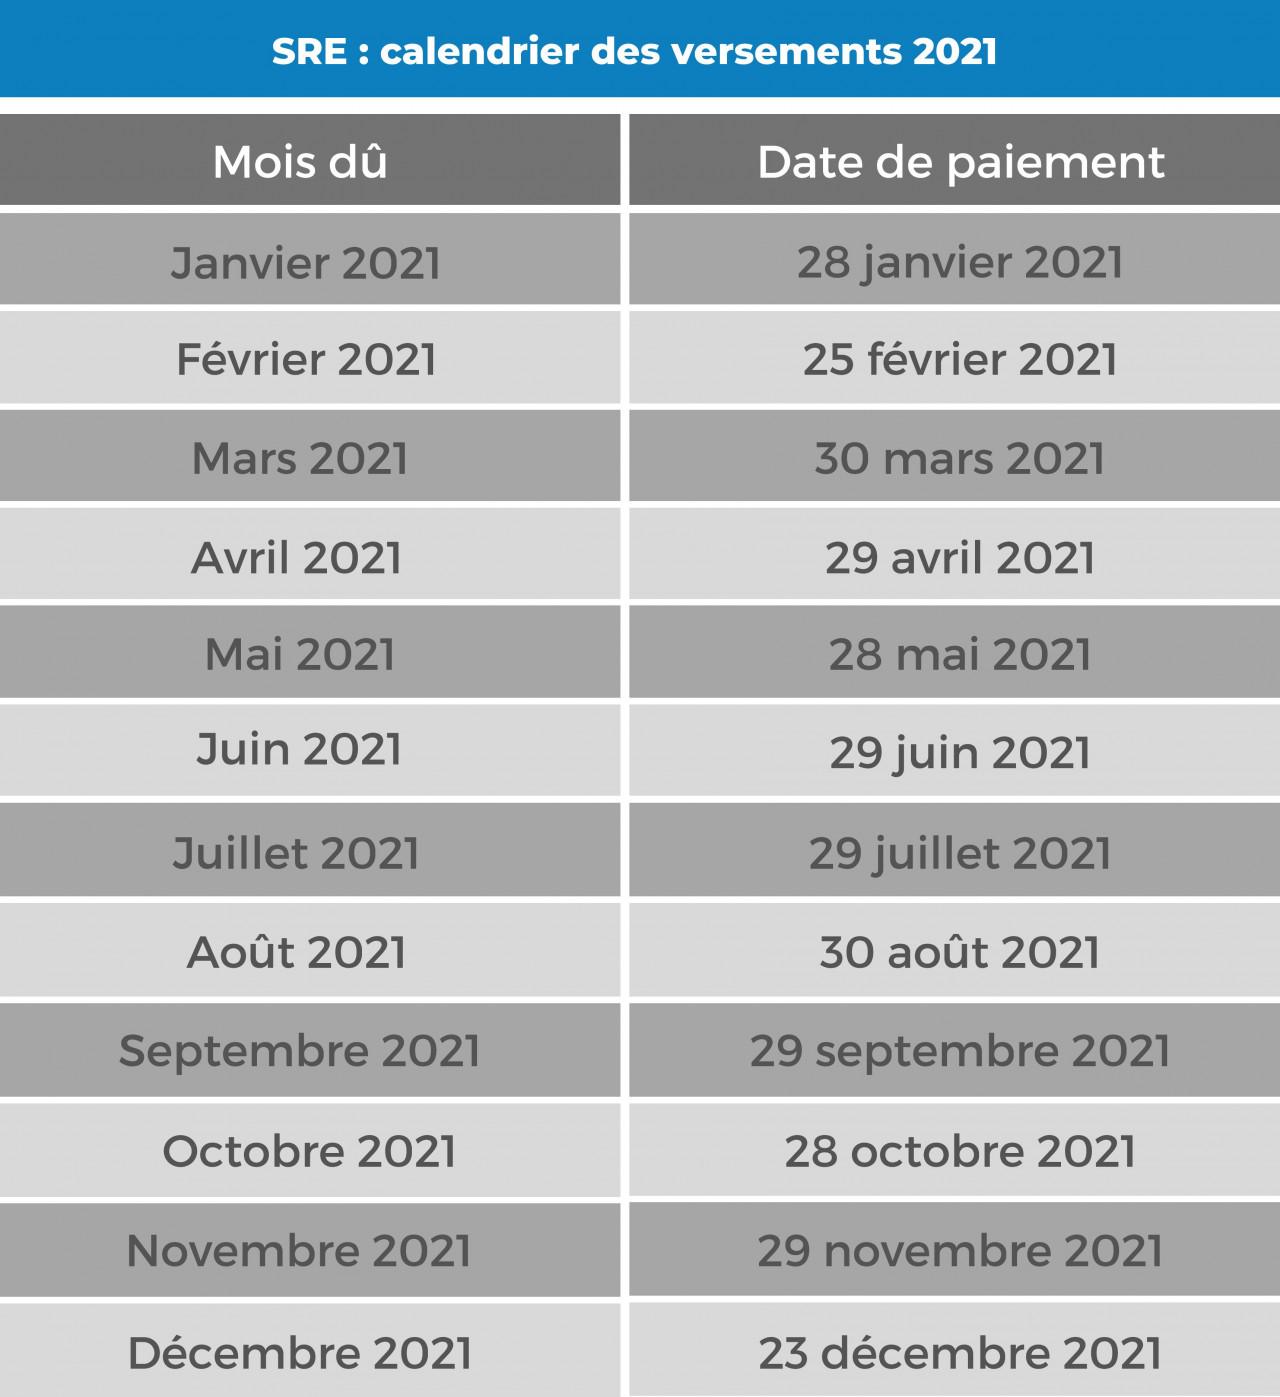 Calendrier 2021 de versement des pensions de retraite